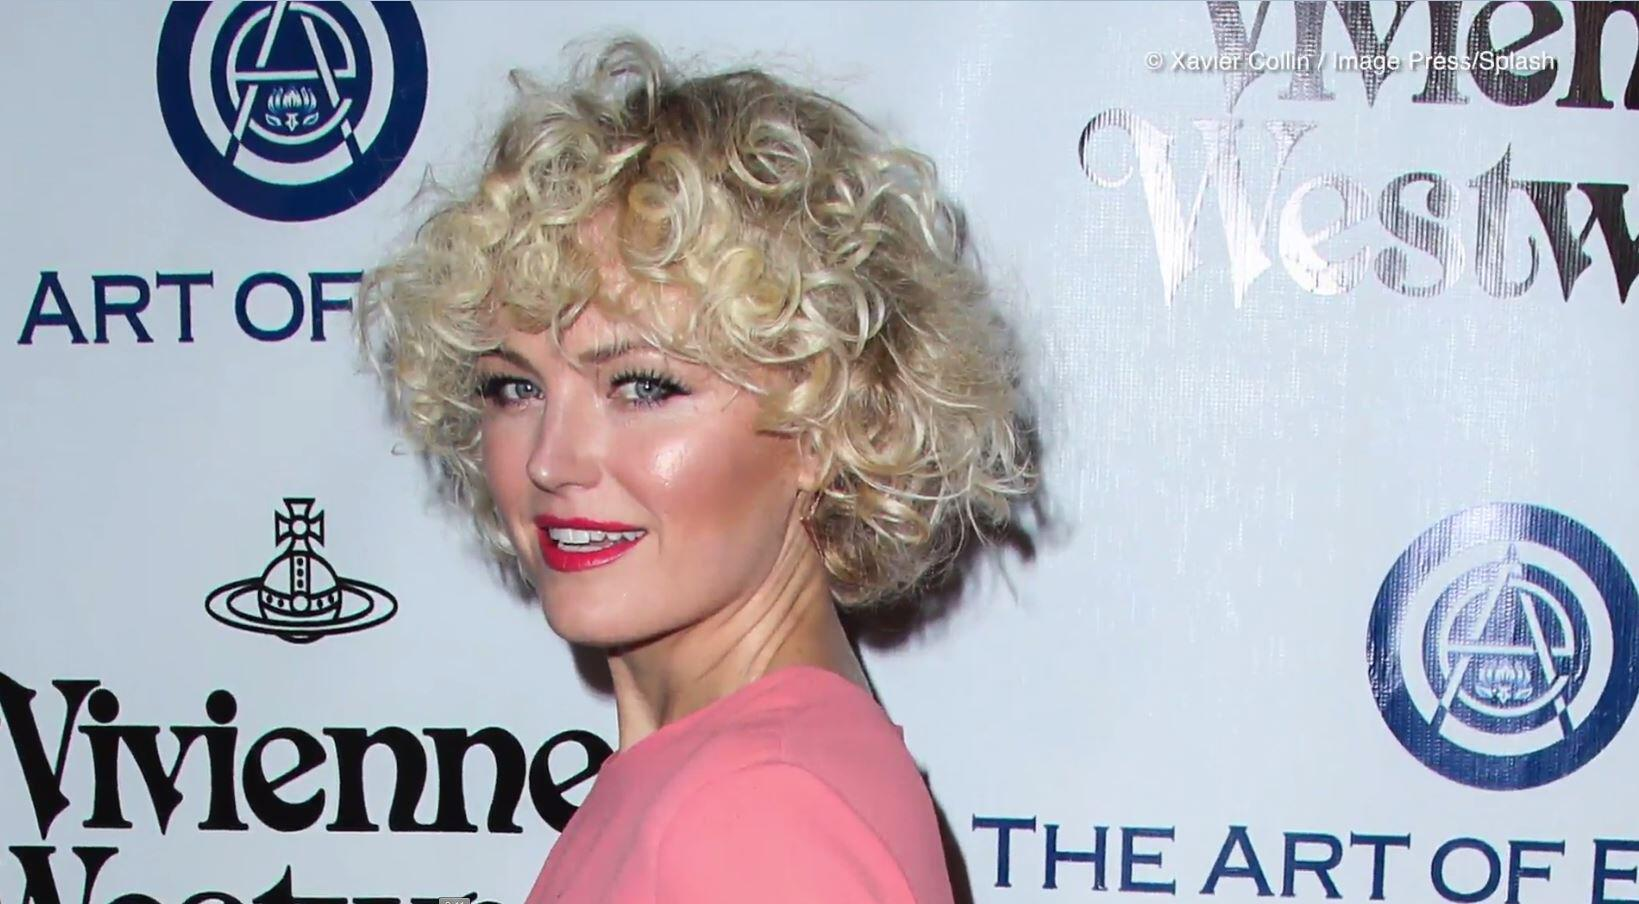 Bild zu Grusel-Frisur: Hollywood-Star Malin Akerman im biederen Oma-Style